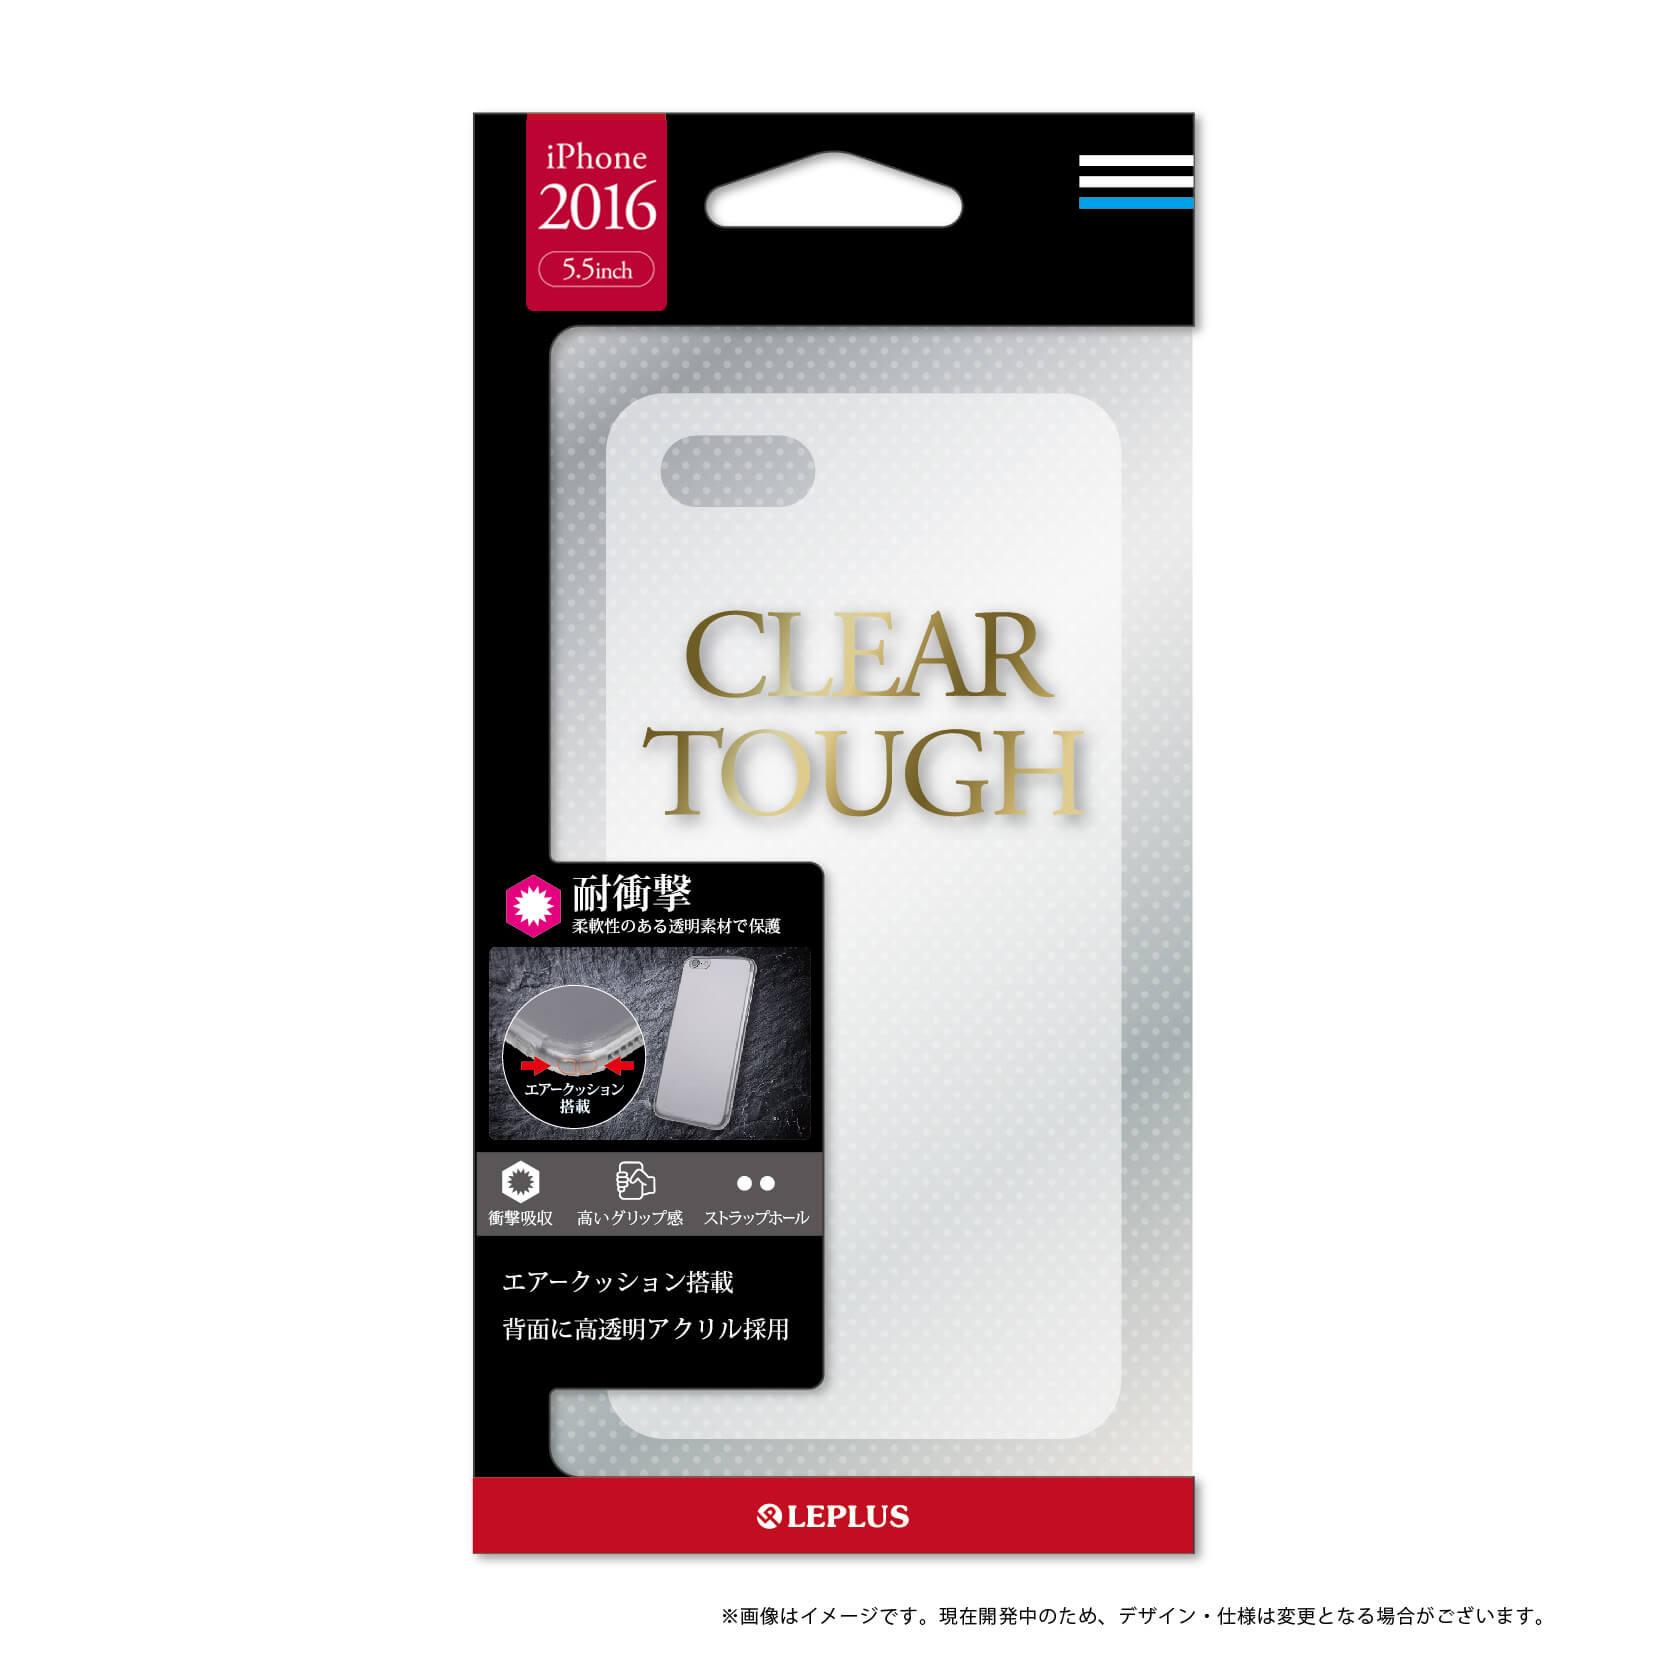 iPhone7 Plus 耐衝撃クリアケース「CLEAR TOUGH」 クリア